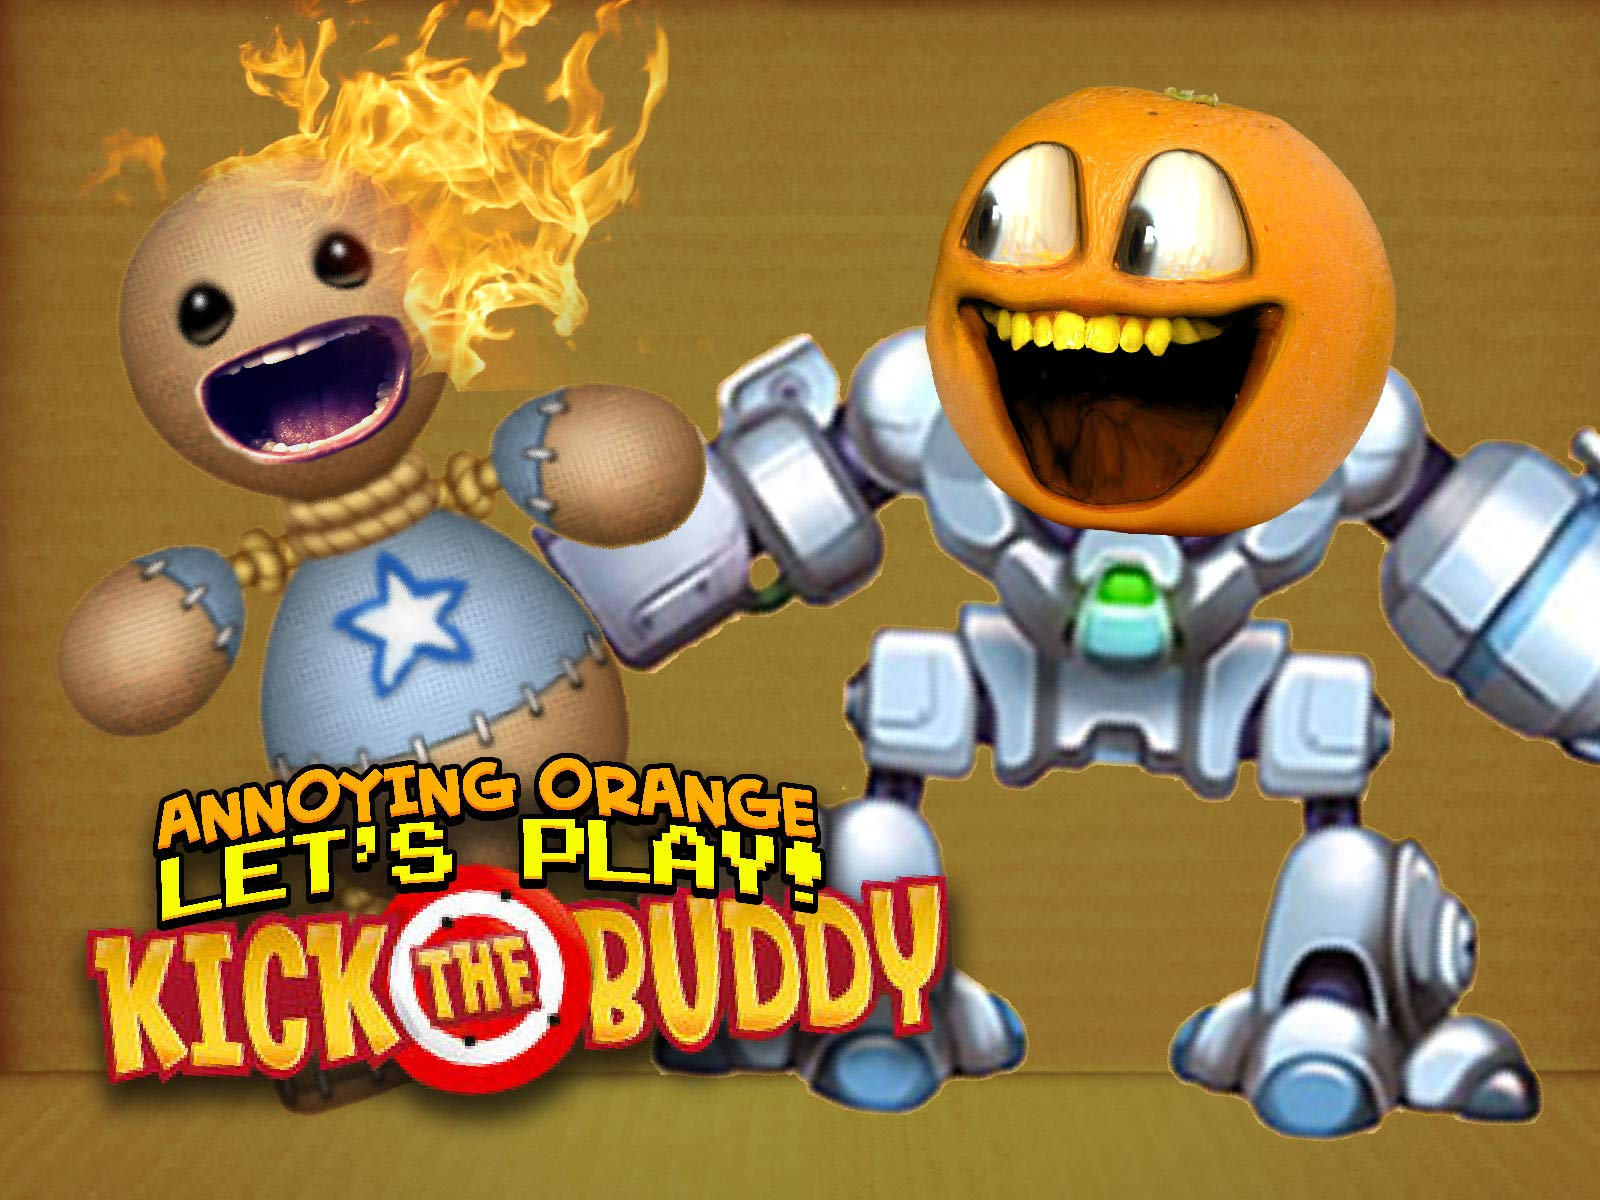 Clip: Annoying Orange plays Kick the Buddy - Season 1